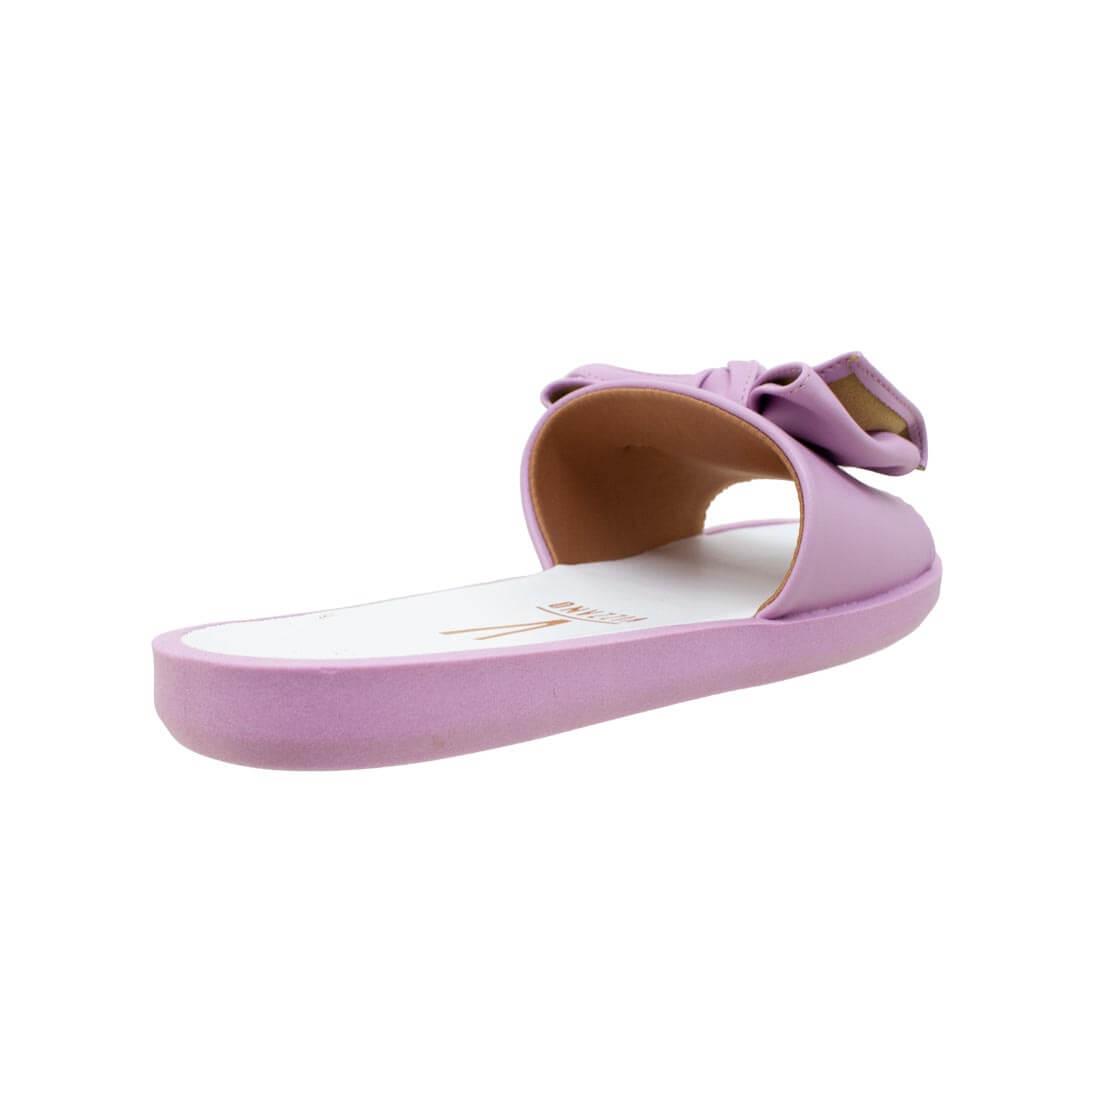 Chinelo Feminino Slide Casual Vizzano Basic Laço